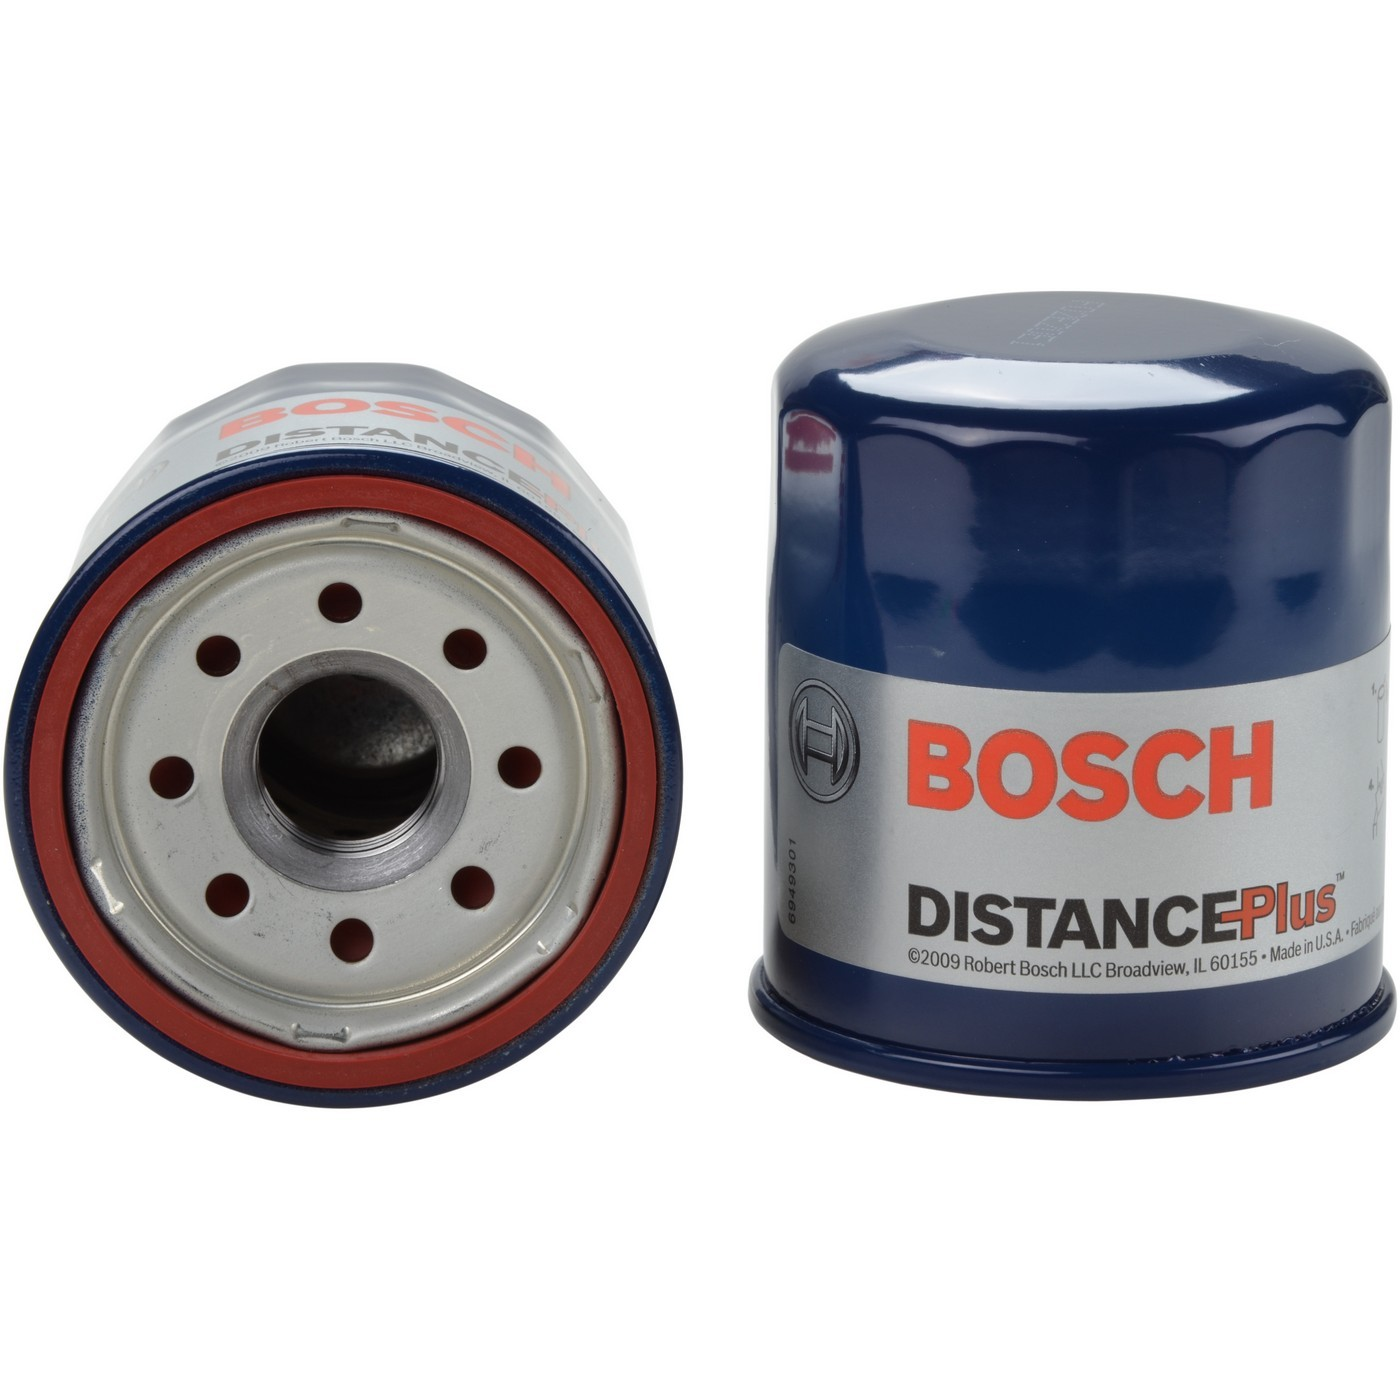 Distanceplus Oil Filter Bosch Auto Parts 1999 Altima Fuel Filters